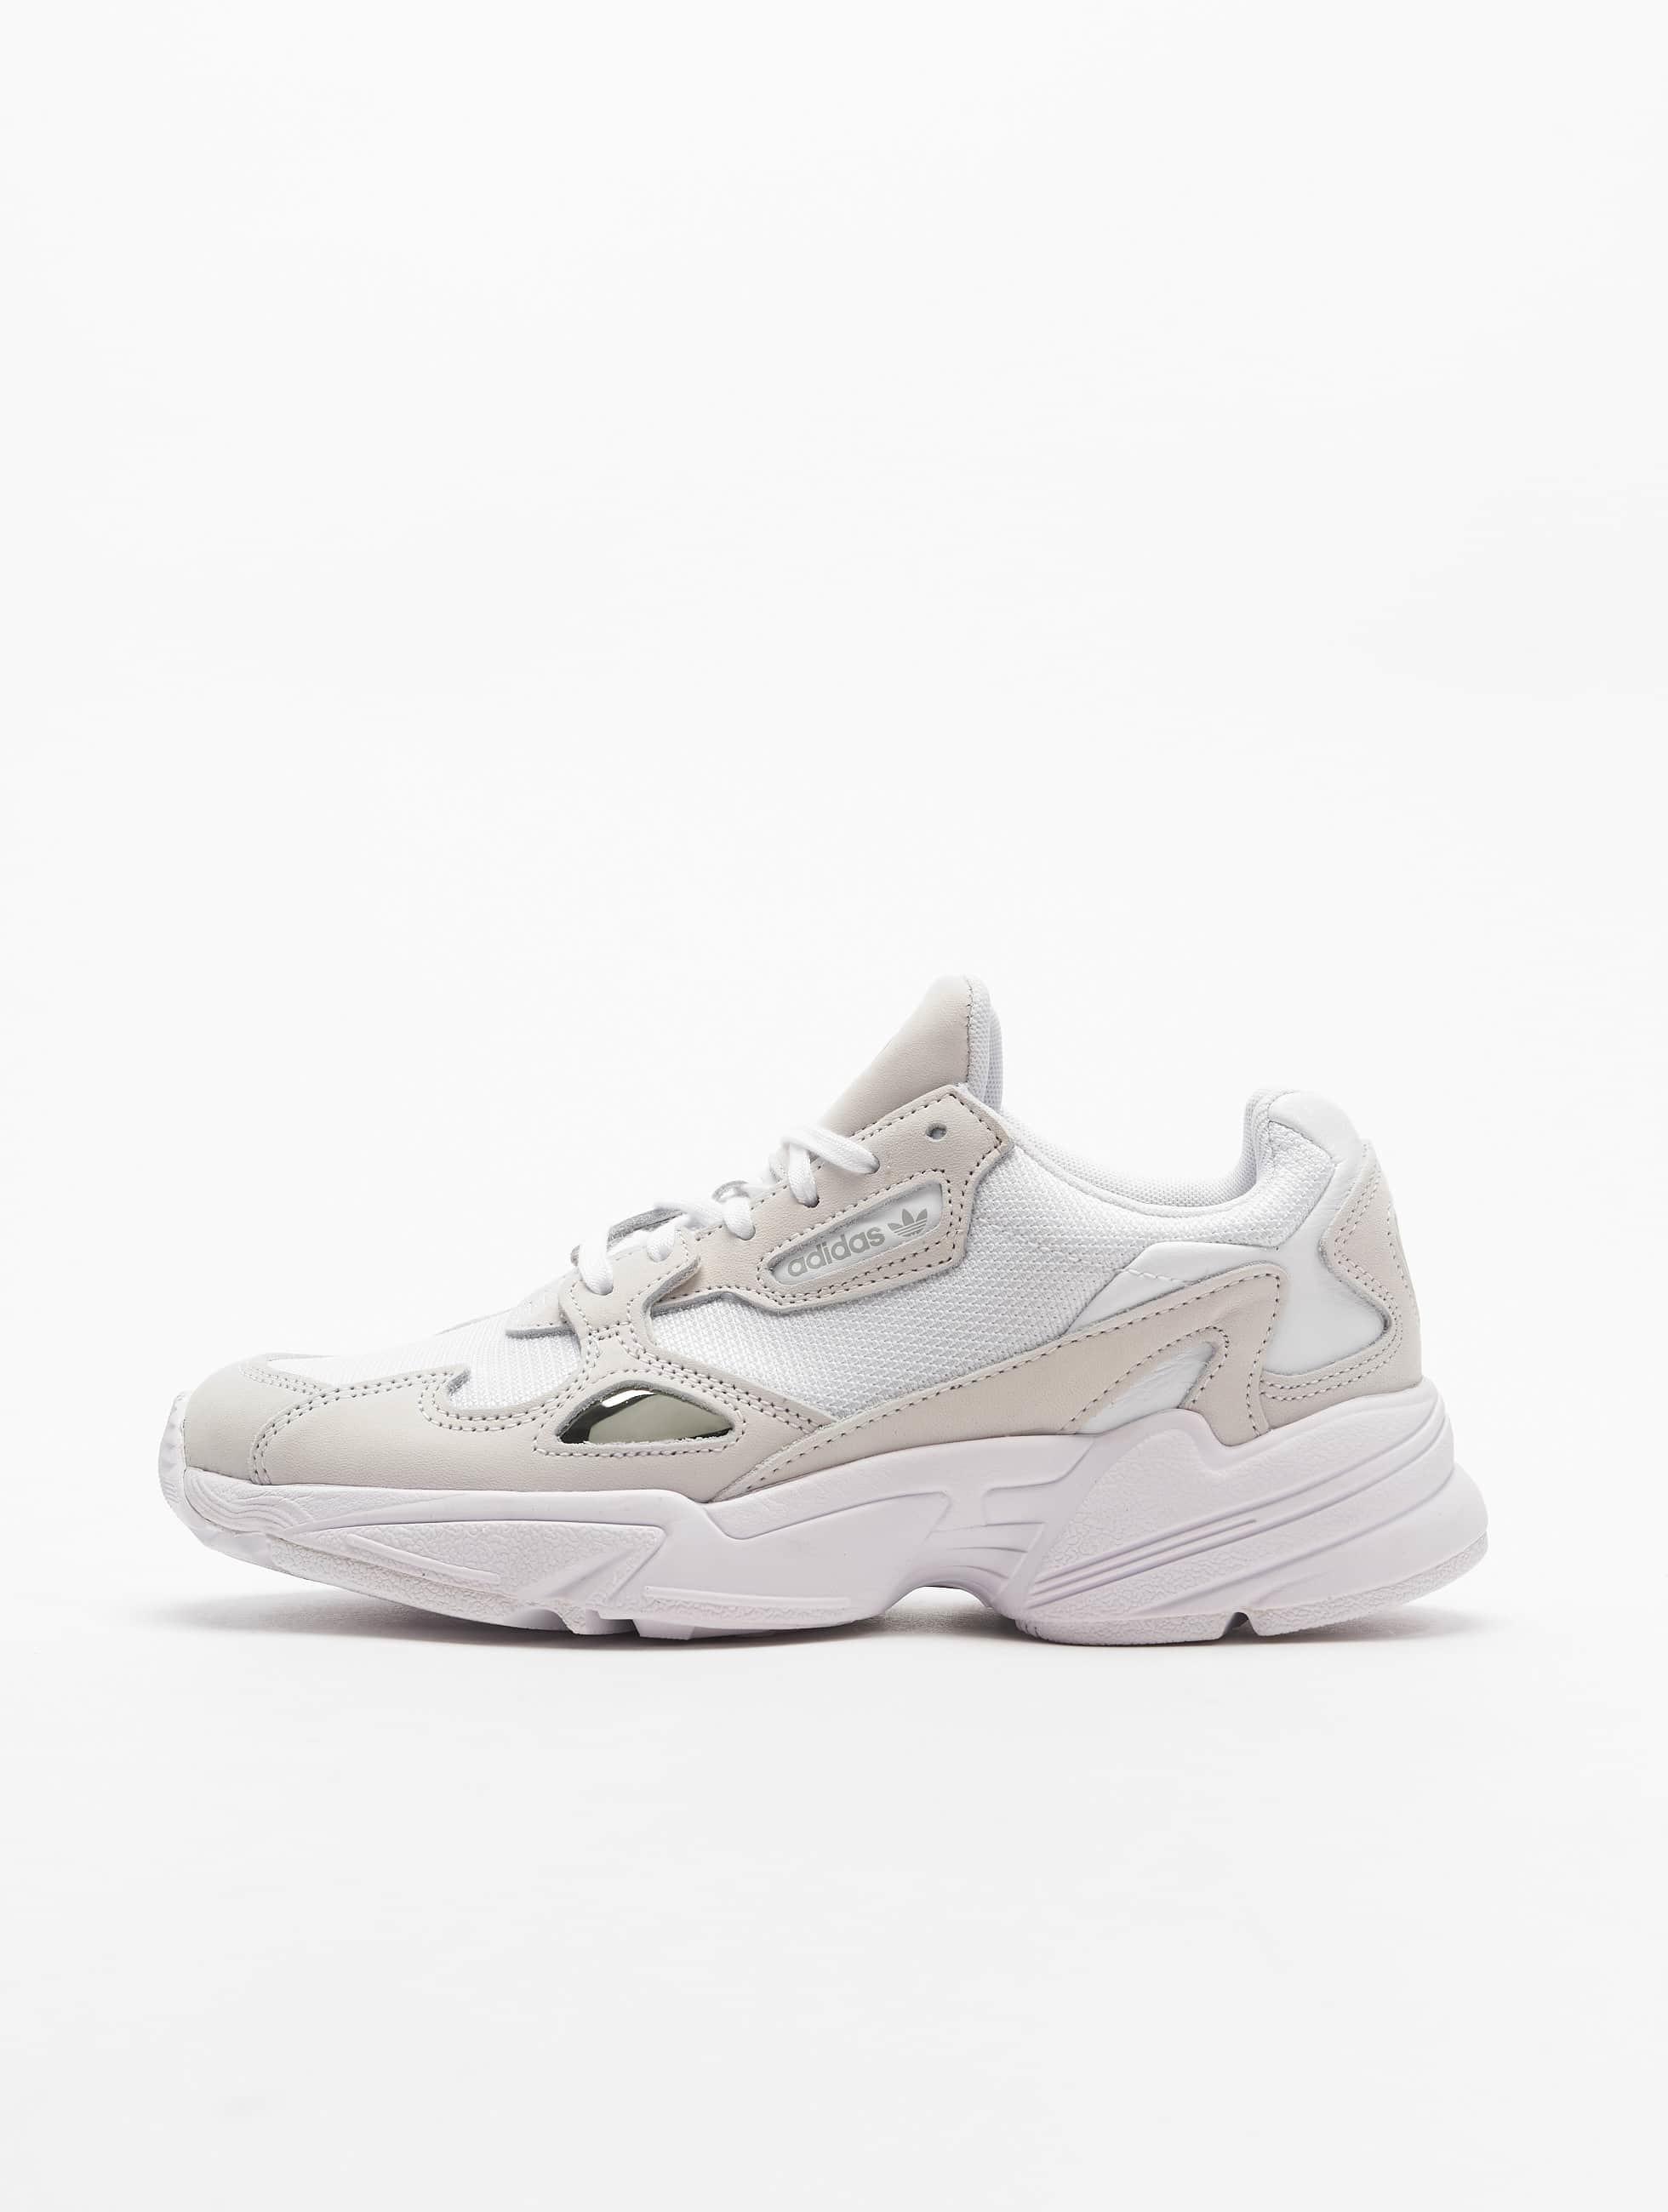 nyanlända amazon bästa priserna adidas Originals Skor / Sneakers Falcon W i vit 543009